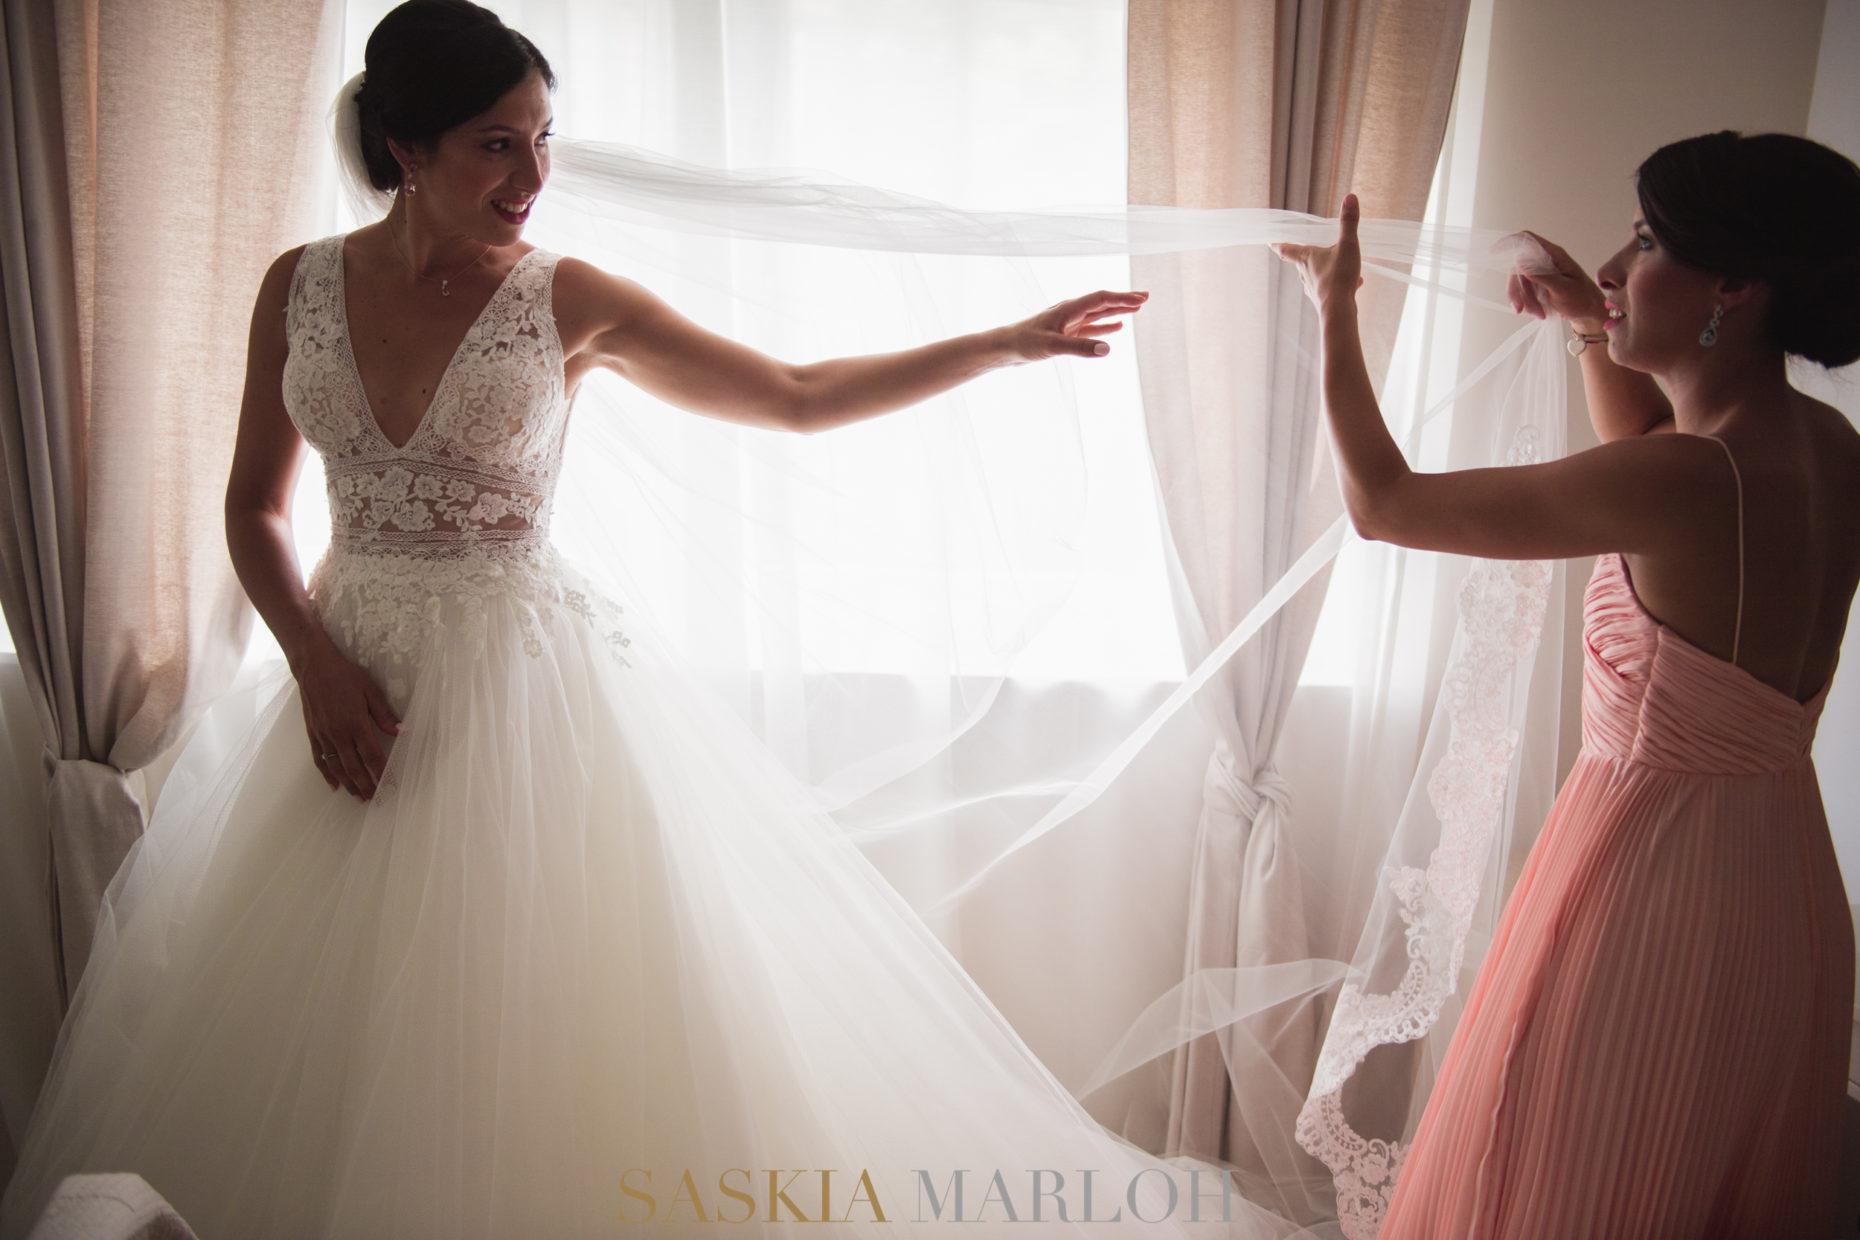 RHEINGAU-ITALIAN-WEDDING-ITALIENISCHE-HOCHZEIT-FOTO-SASKIA-MARLOH-PHOTOGRAPHY-134